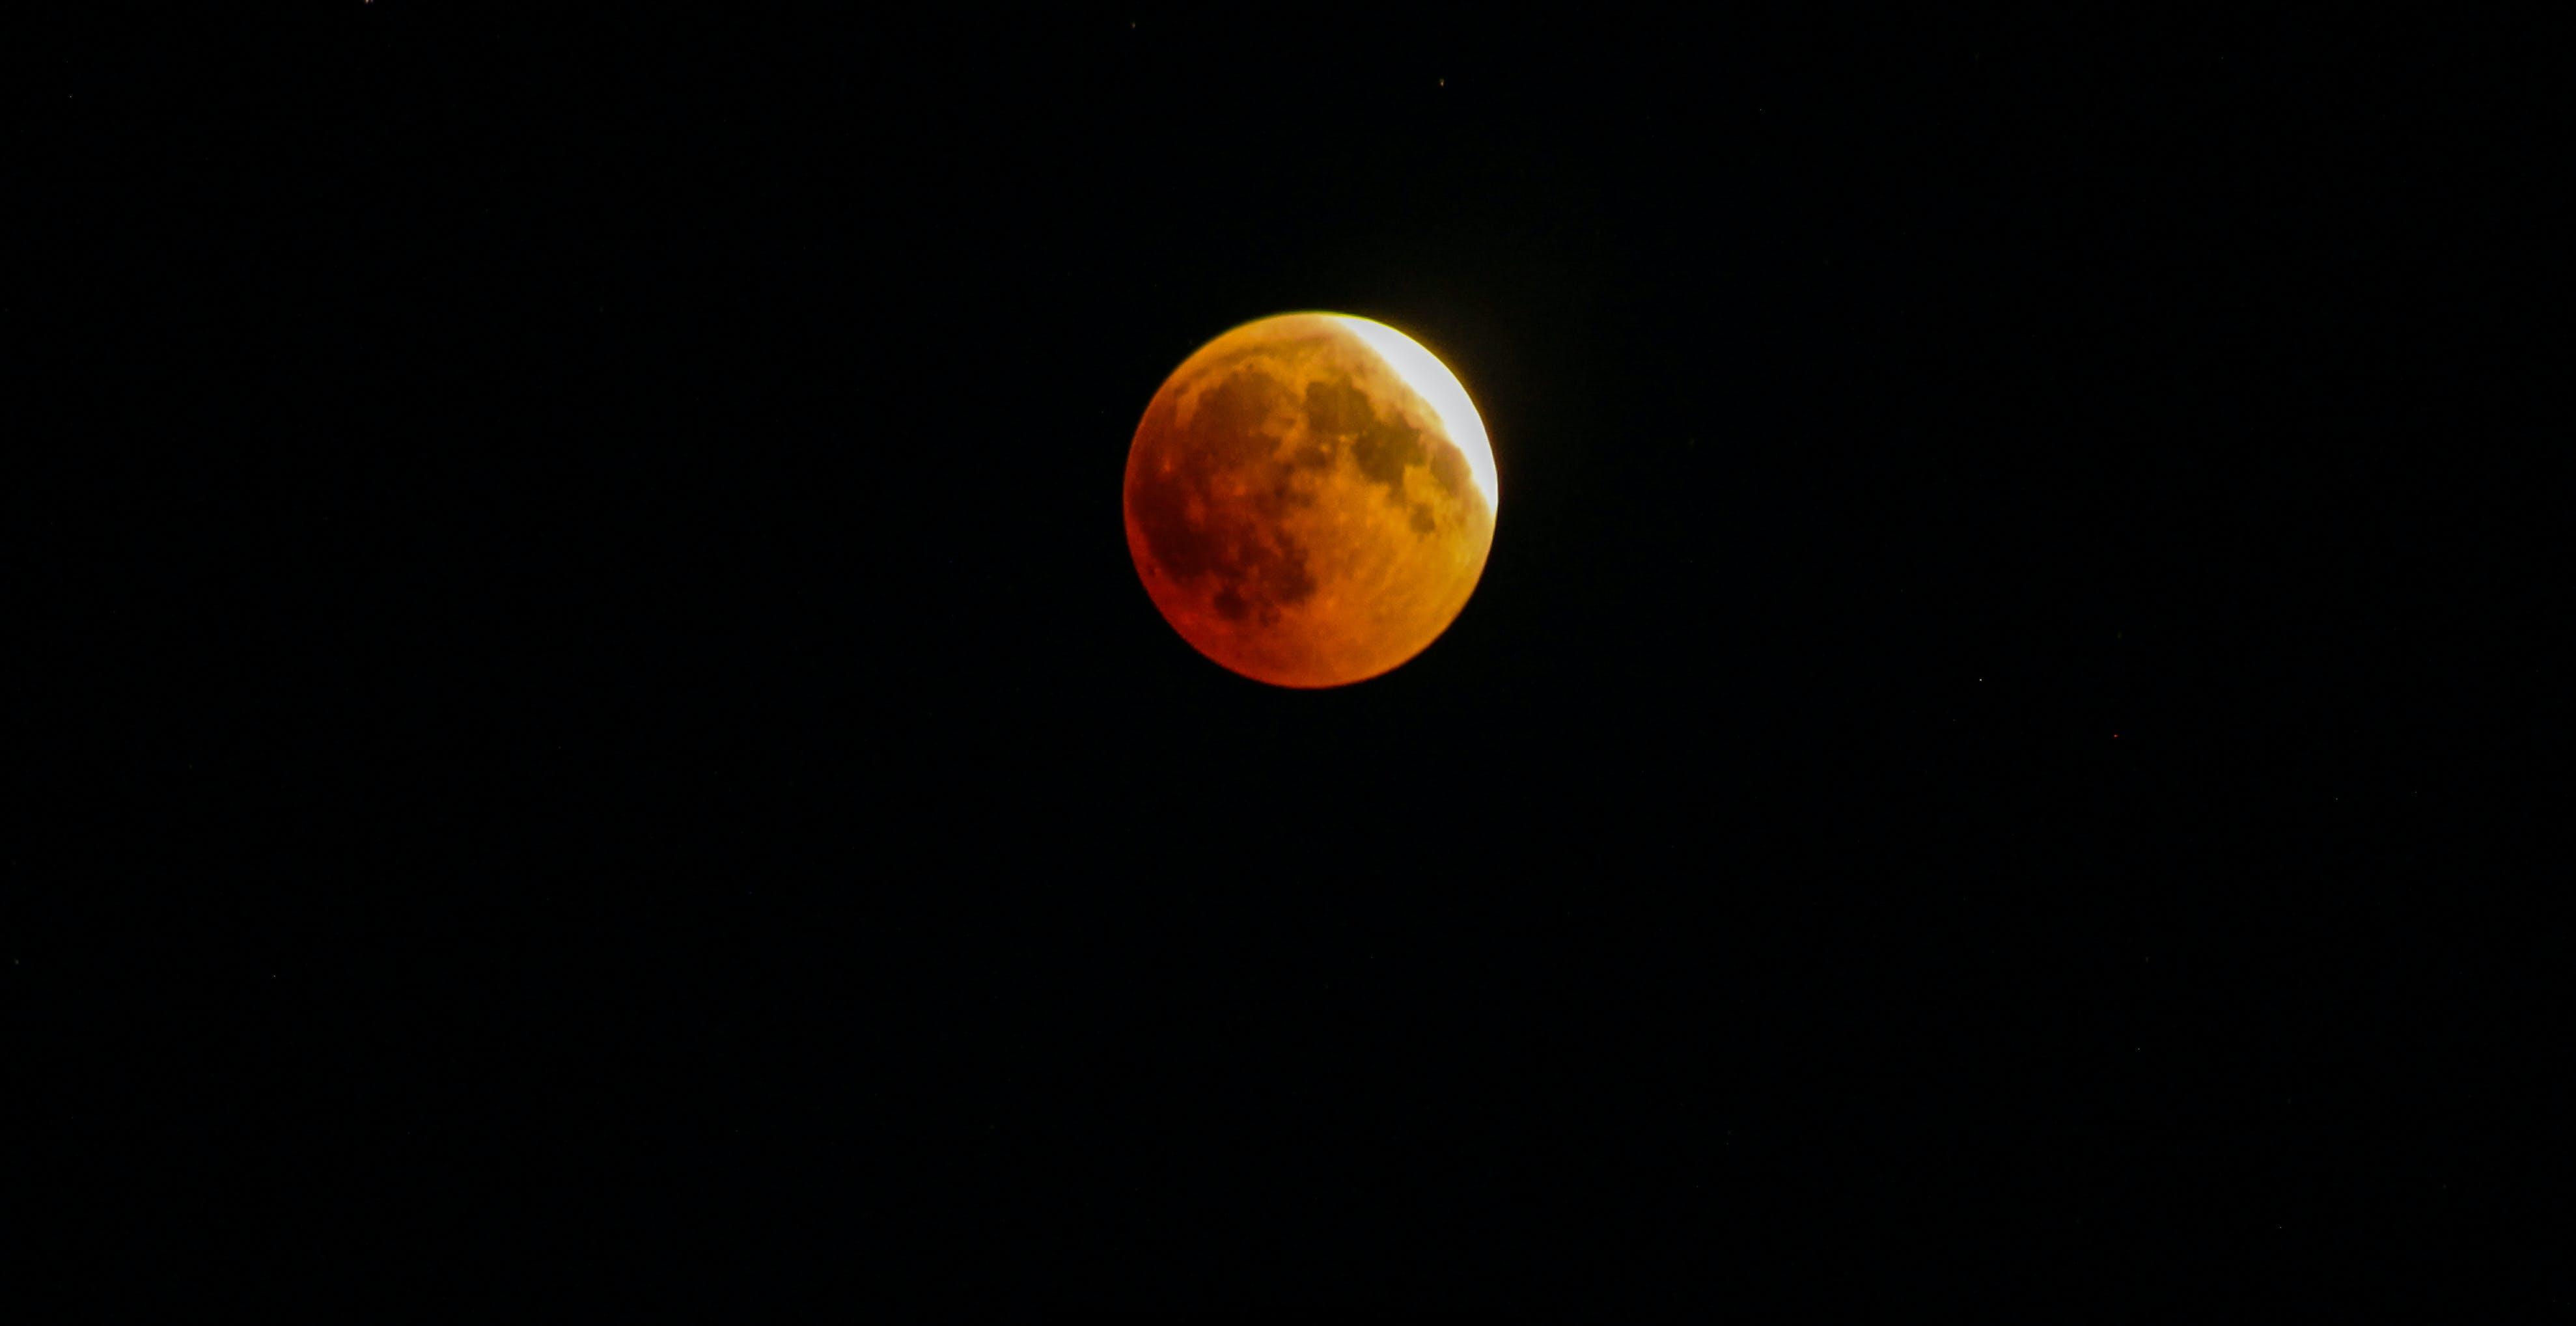 Free stock photo of sky, moon, Syria, blood moon